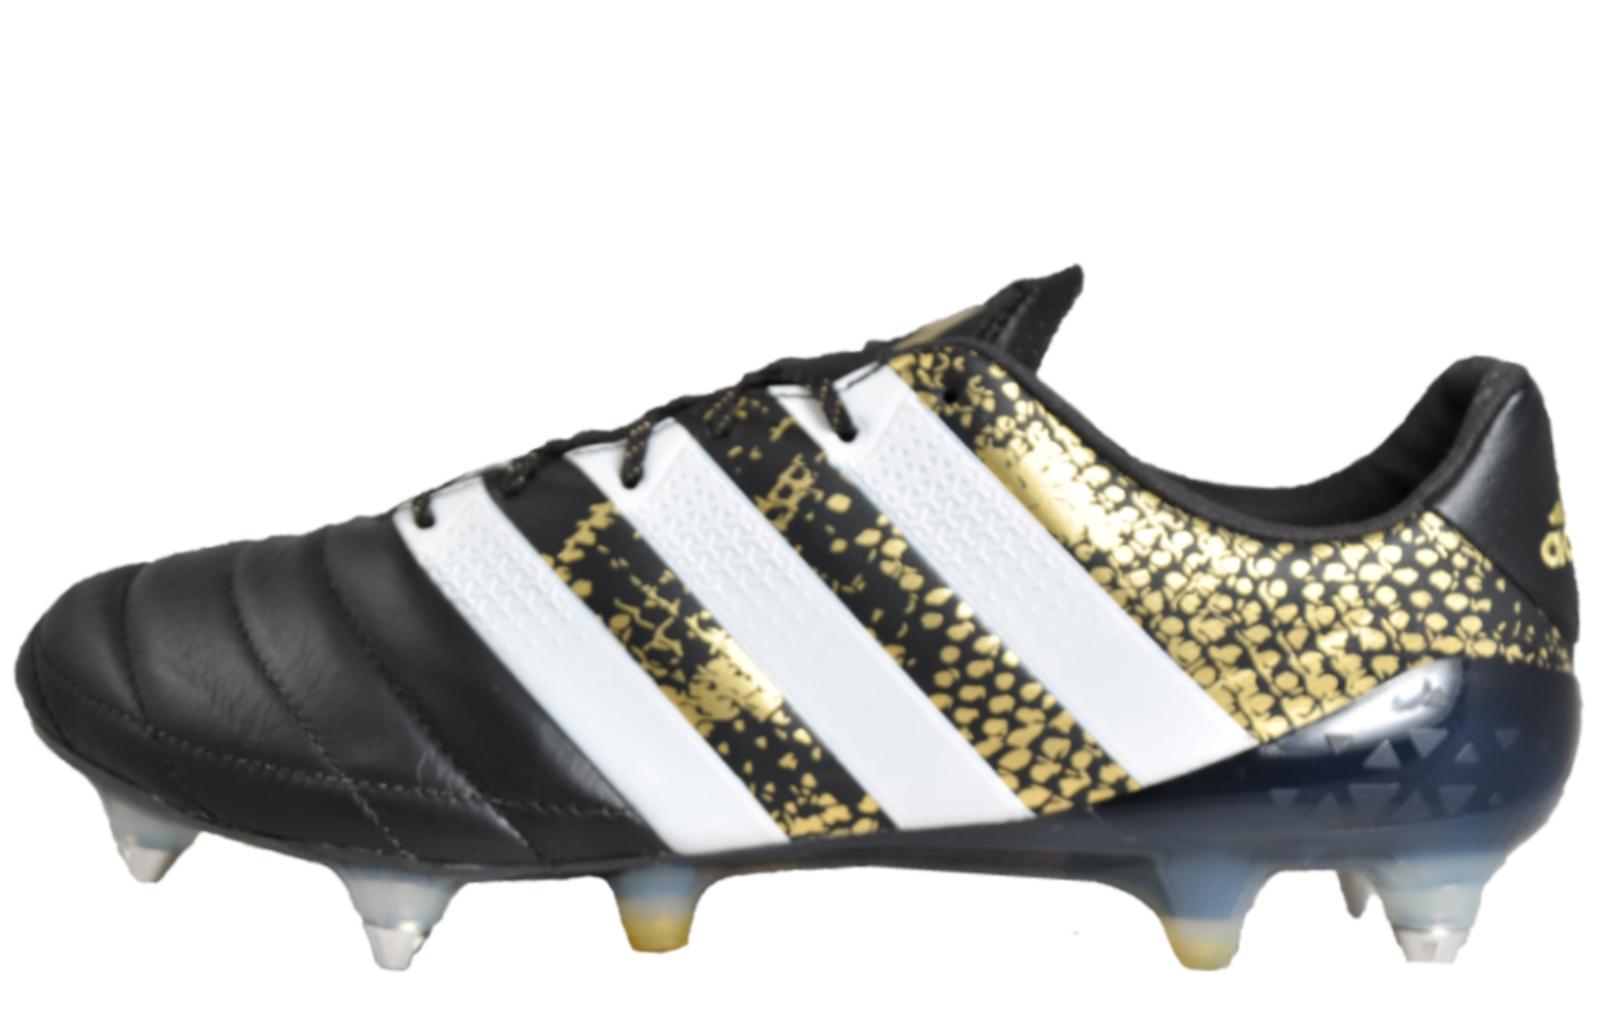 adidas X 16.2 FG Men's Football Boots, Green 40 23 (UK